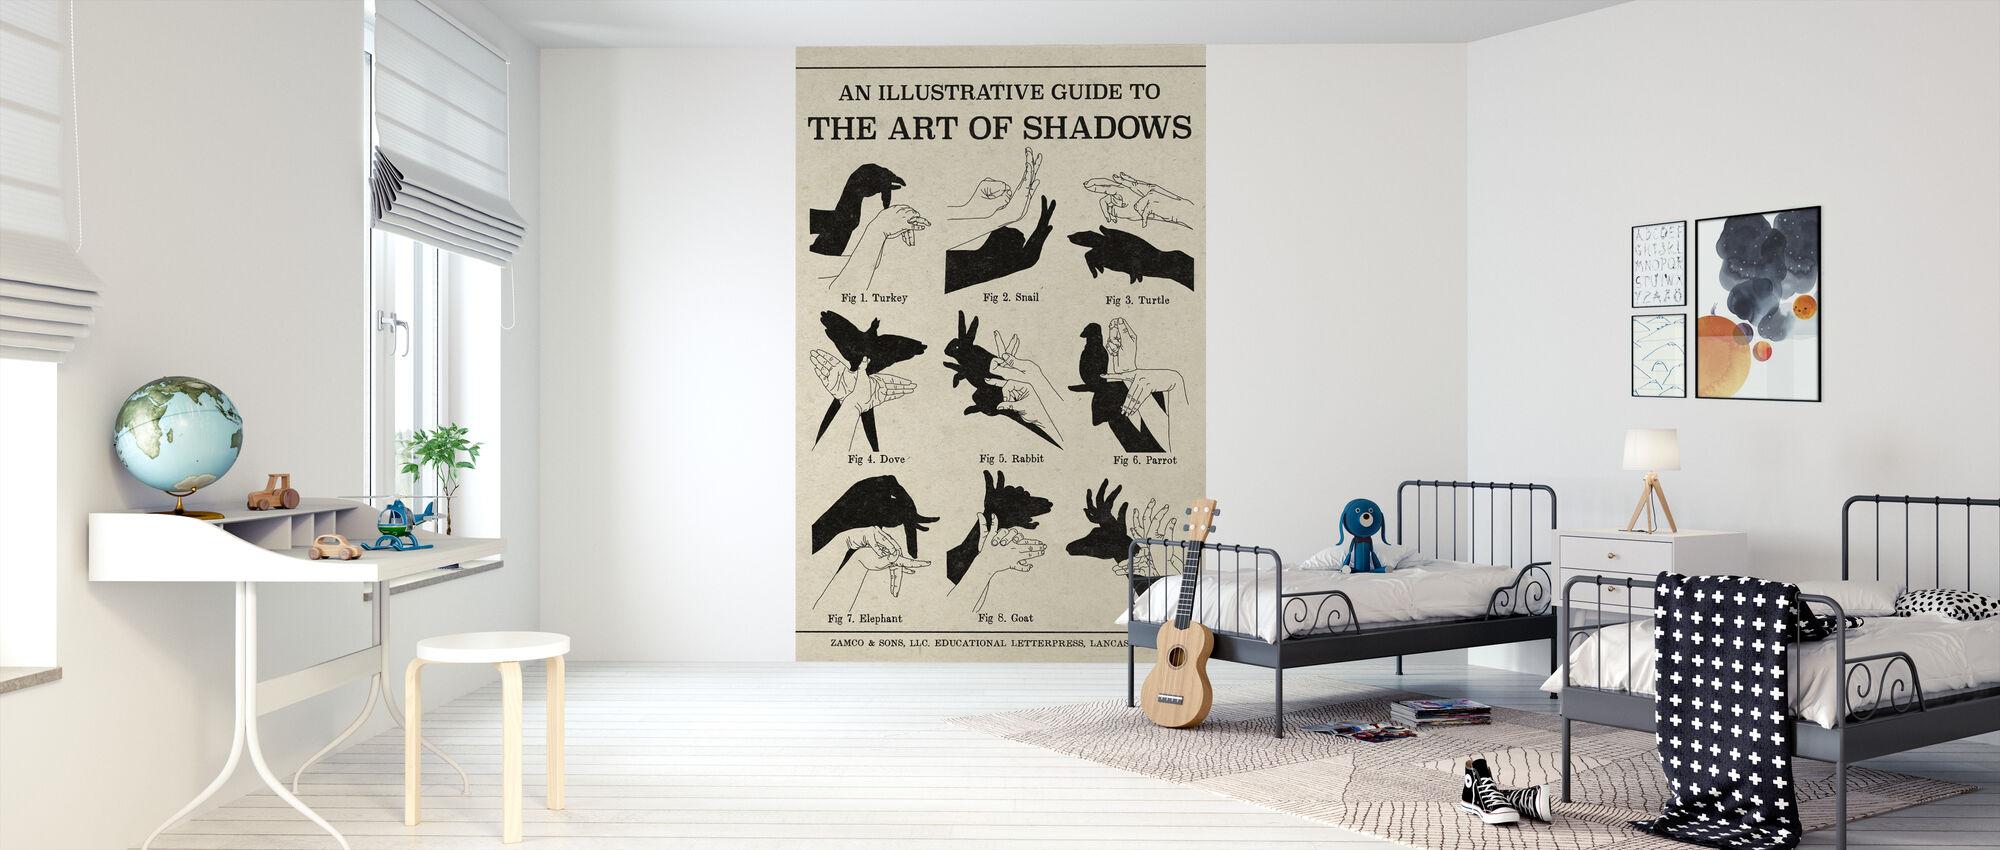 The Art of Shadows - Wallpaper - Kids Room